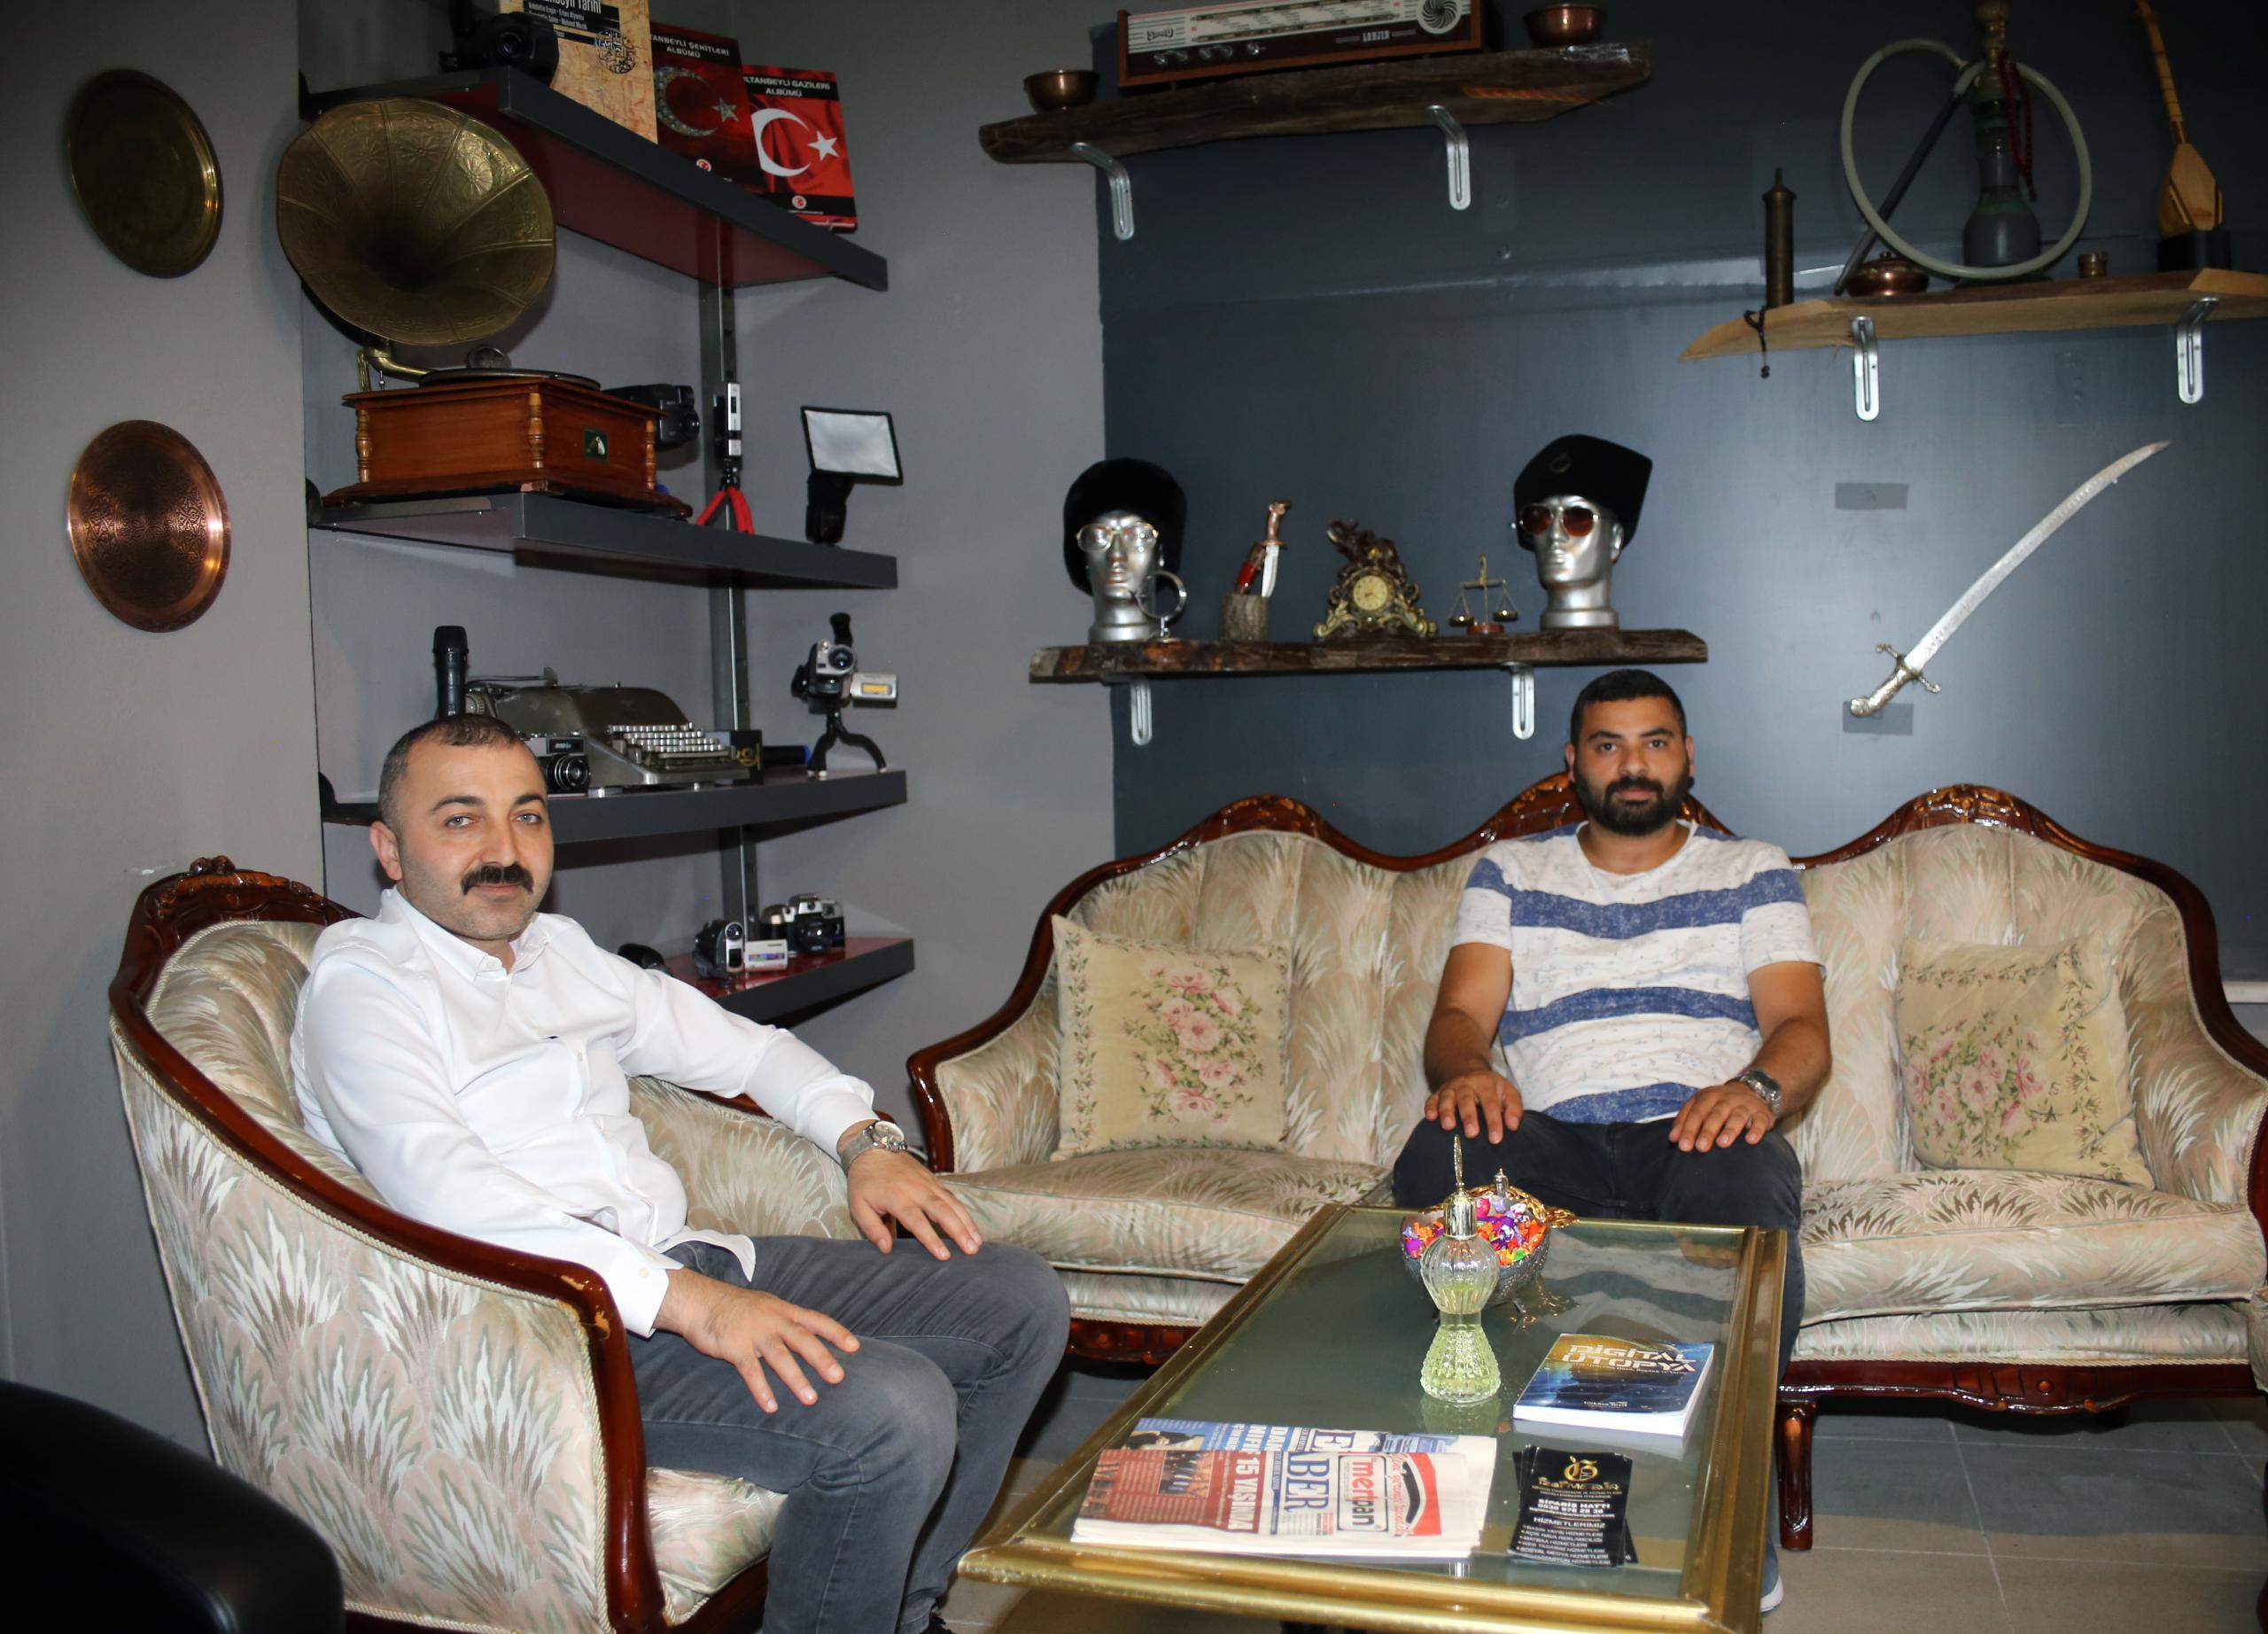 MHP SULTANBEYLİ'DEN İZGİ MEDYA'YA HAYIRLI OLSUN ZİYARETİ